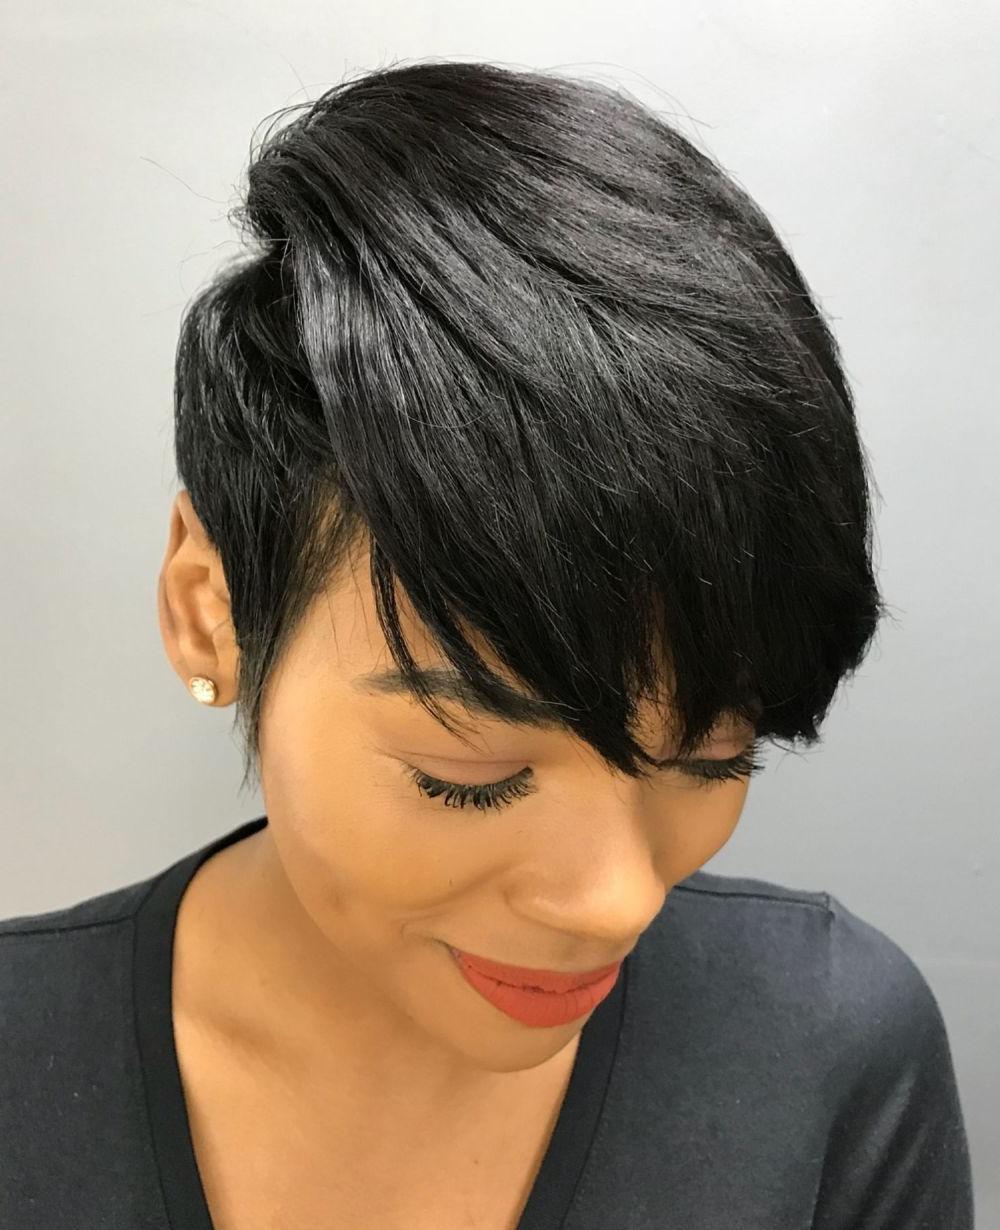 Short Hair (View 3 of 20)